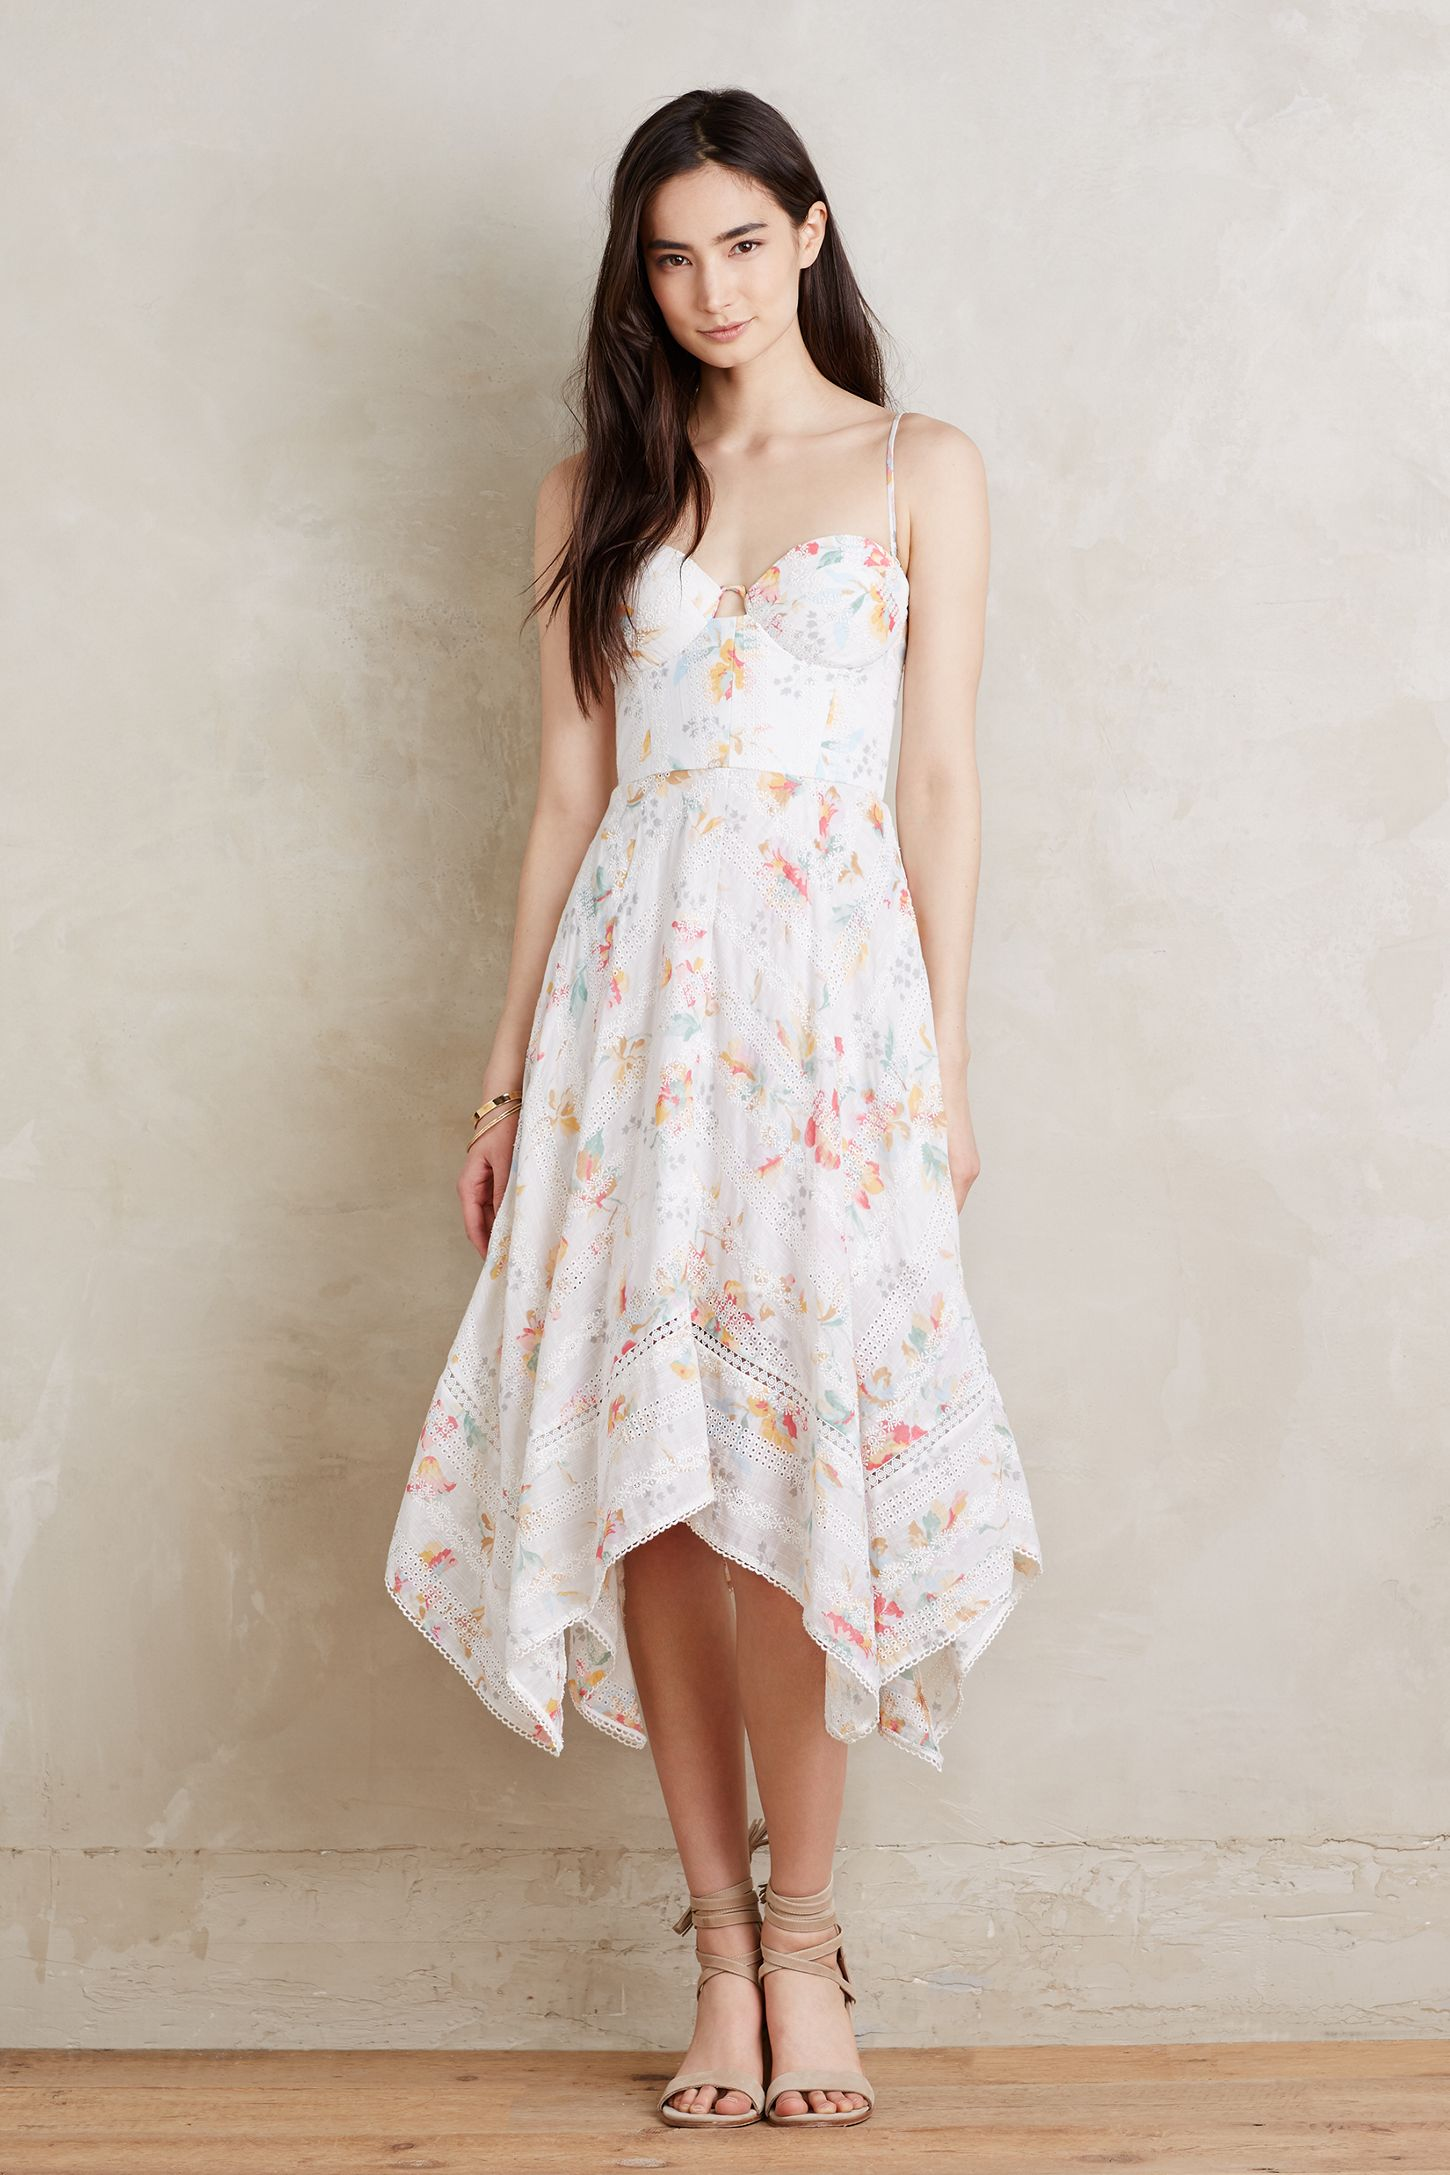 002c19557a Belle Bustier Dress